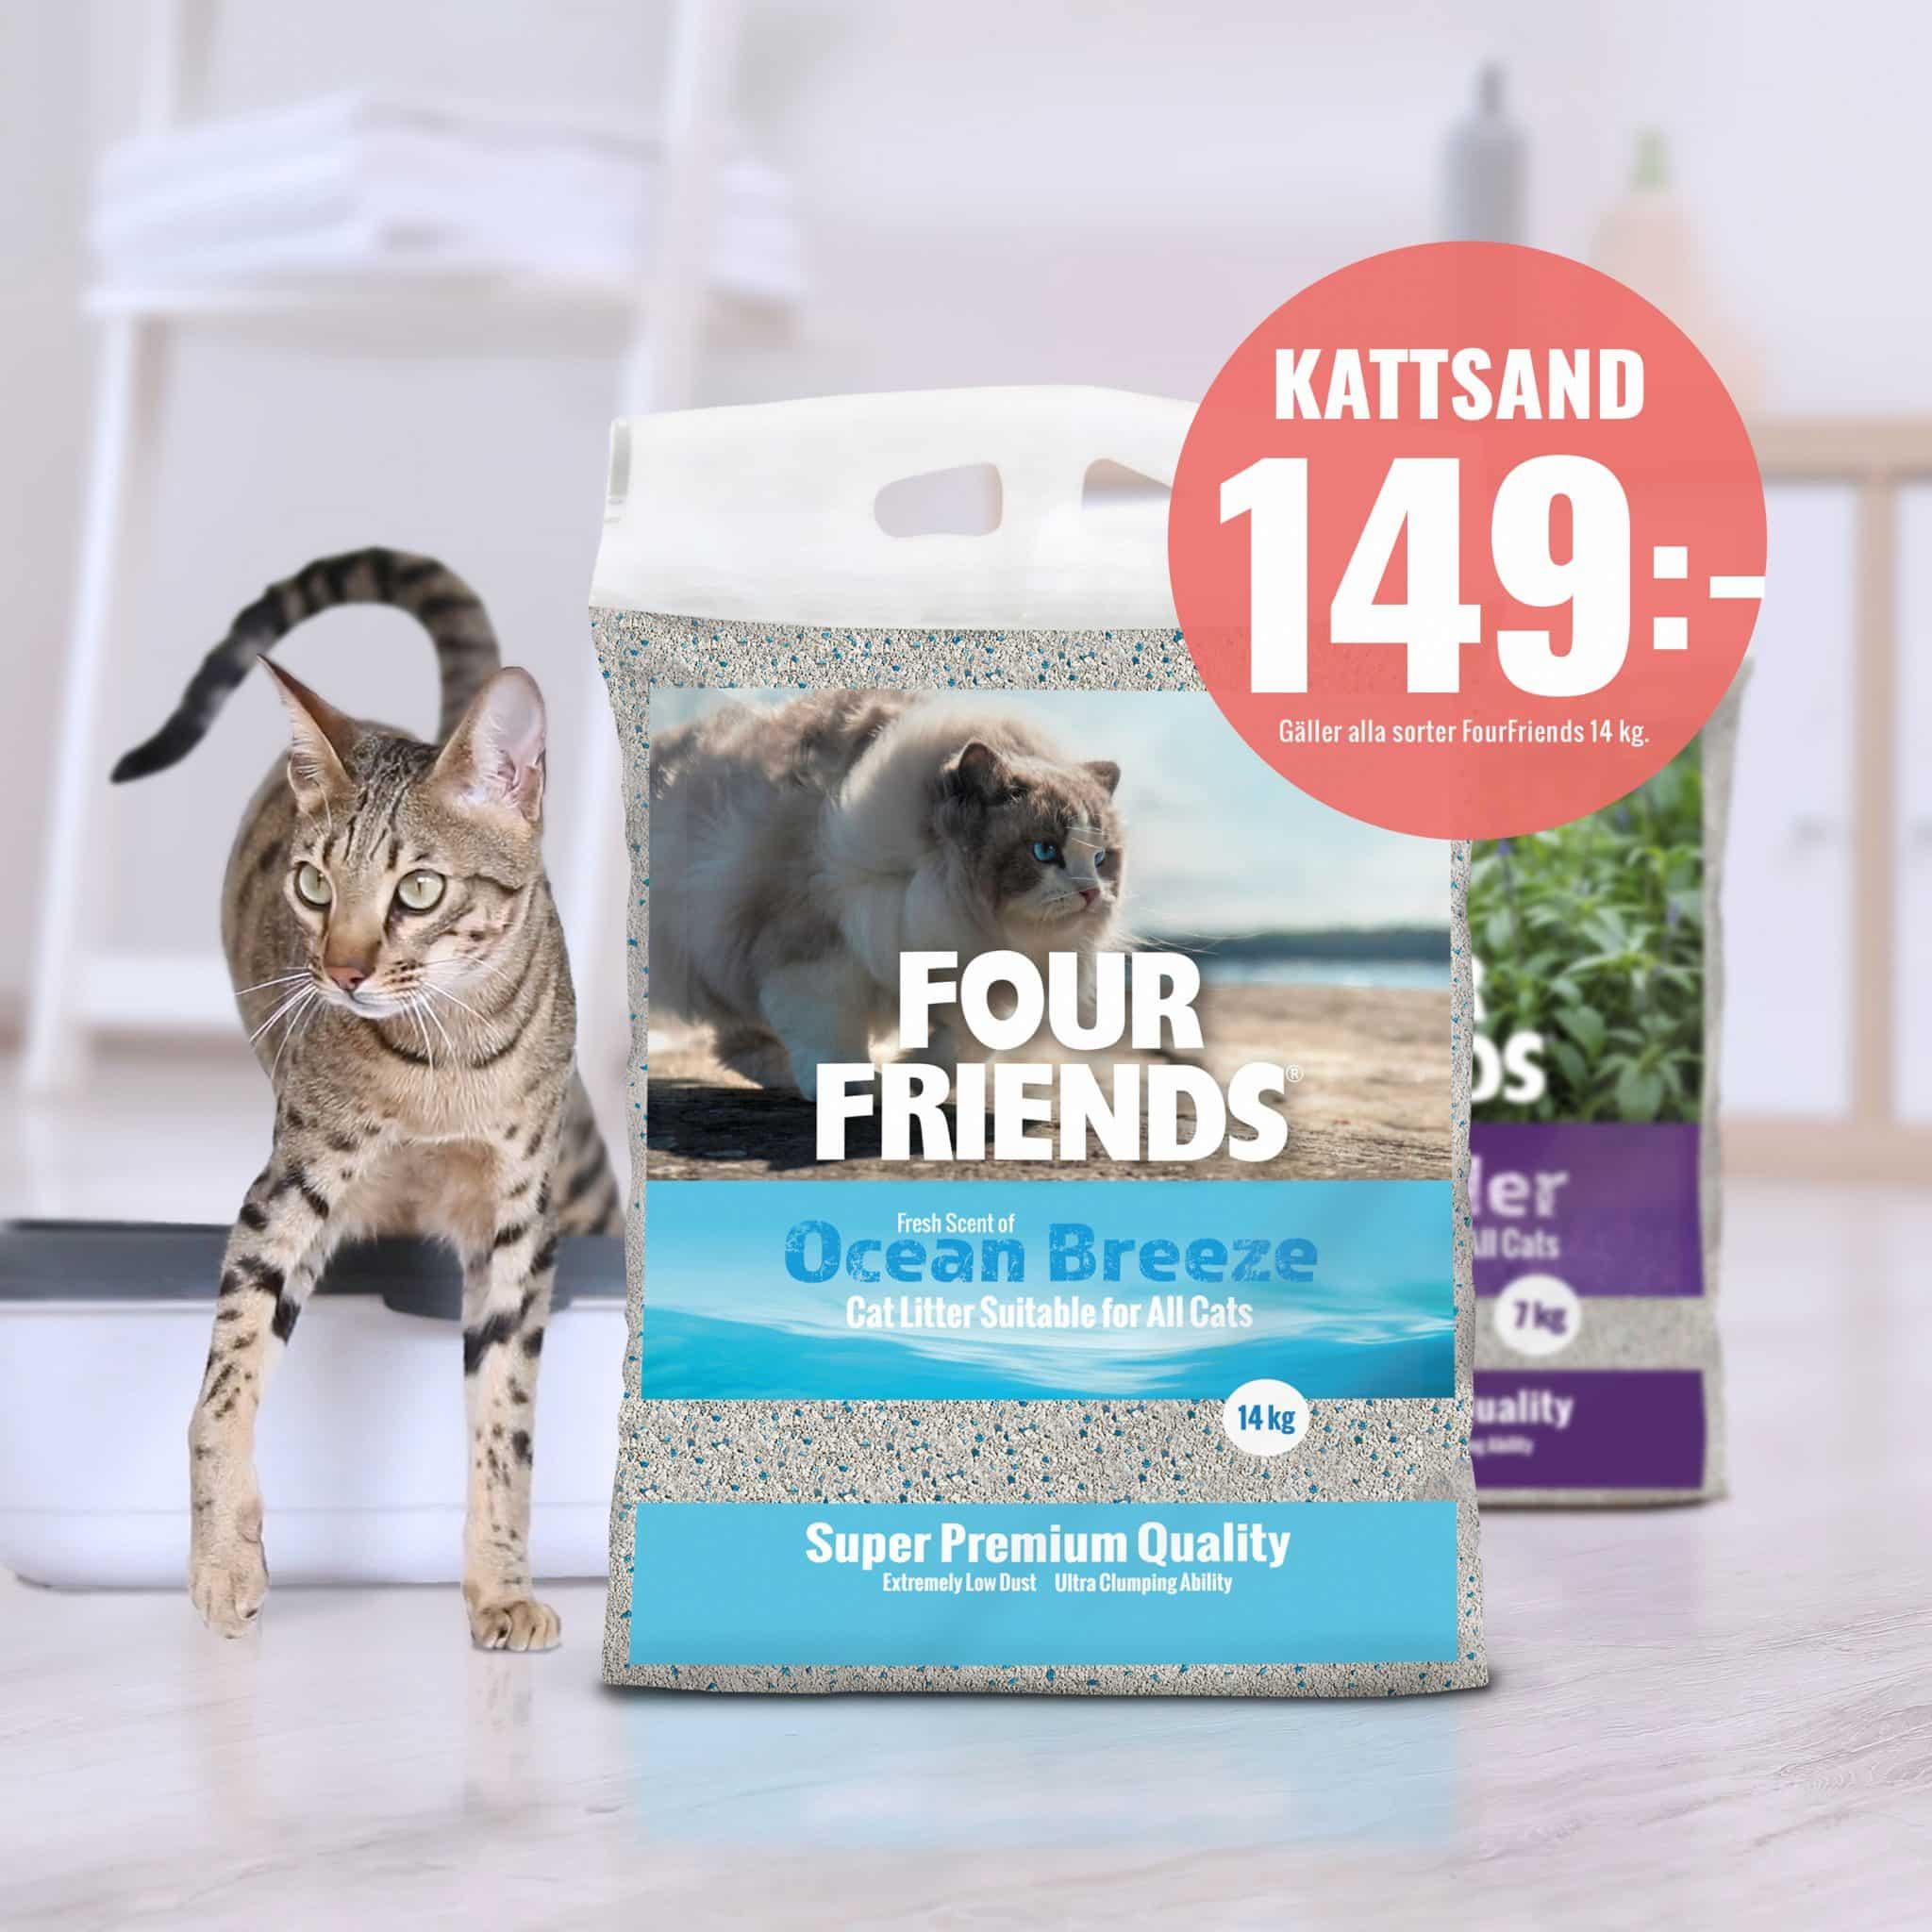 FourFriends kattsand 14 kg kampanj